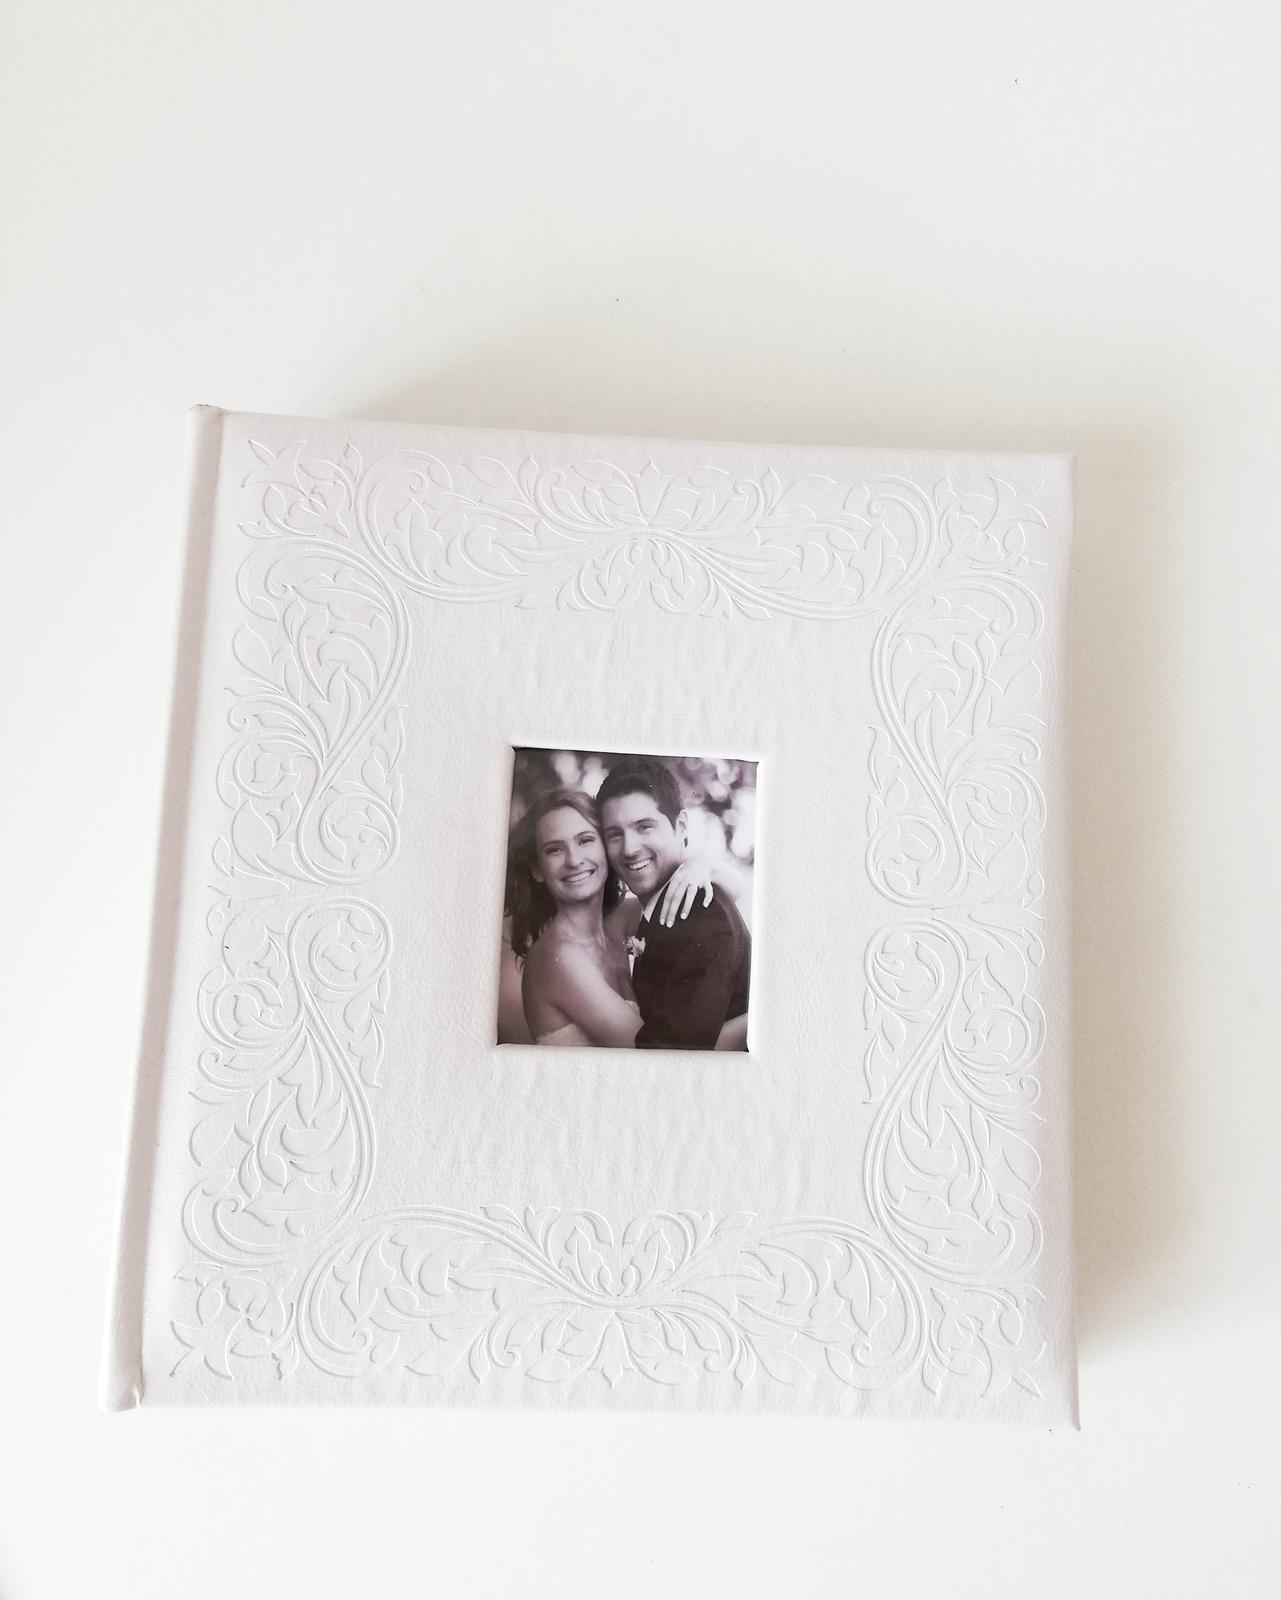 Svatební fotoalbum - Obrázek č. 1